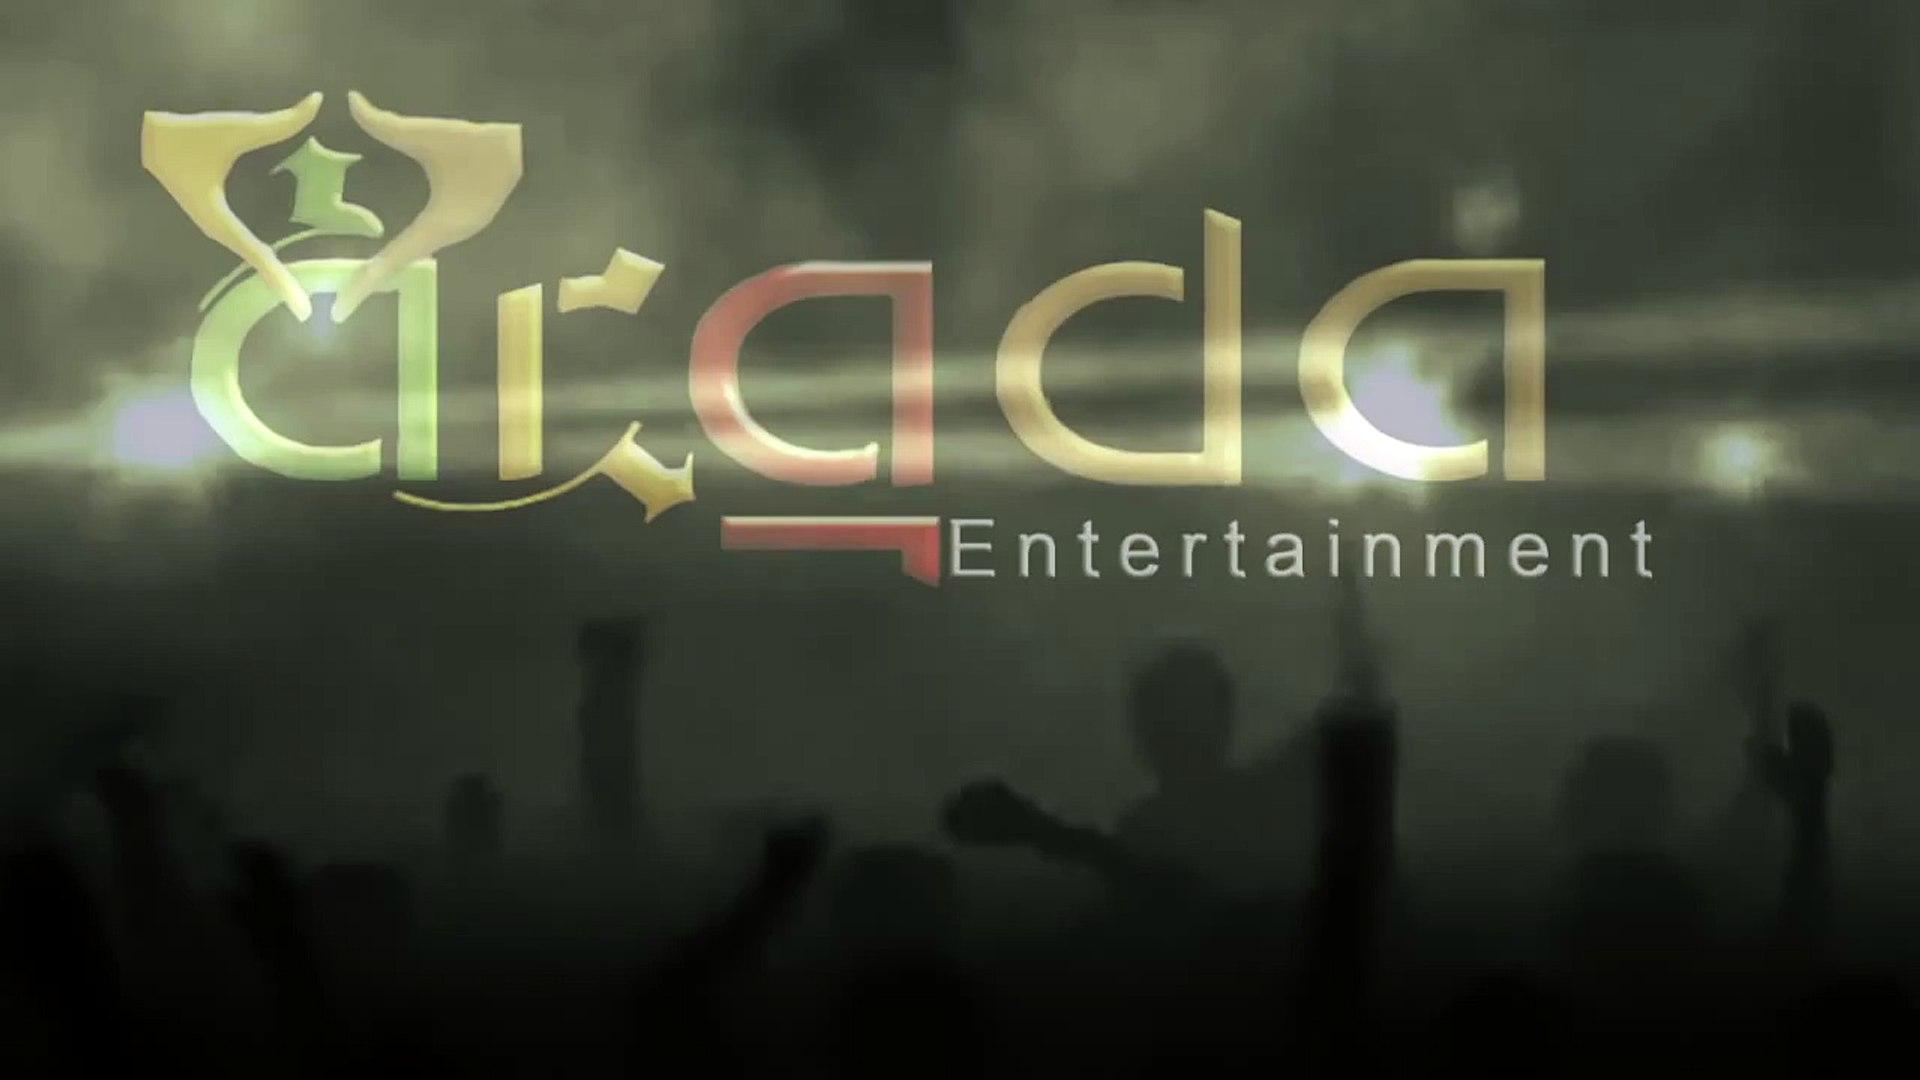 Arada Entertainment